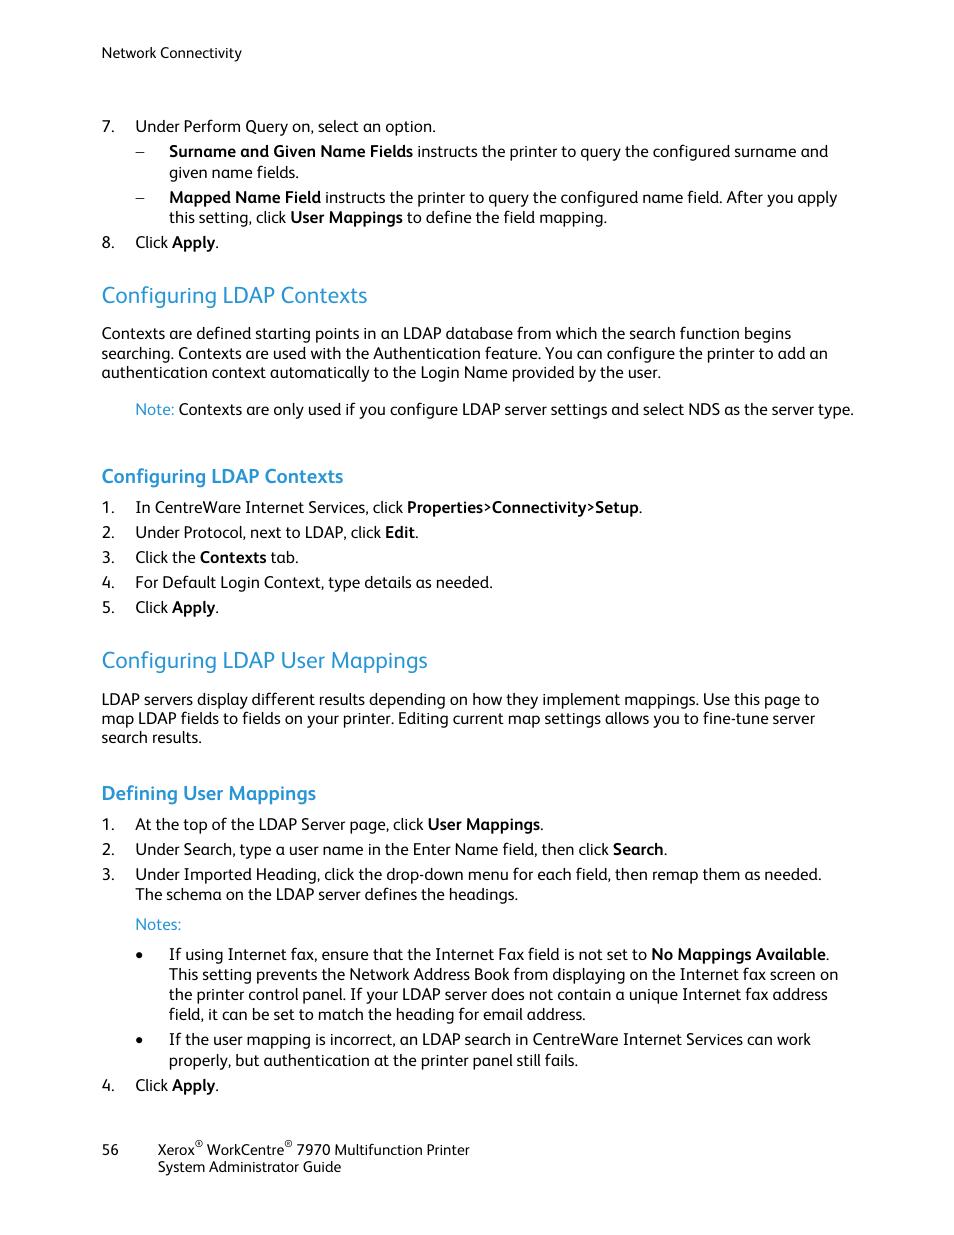 Configuring ldap contexts, Configuring ldap user mappings, Defining